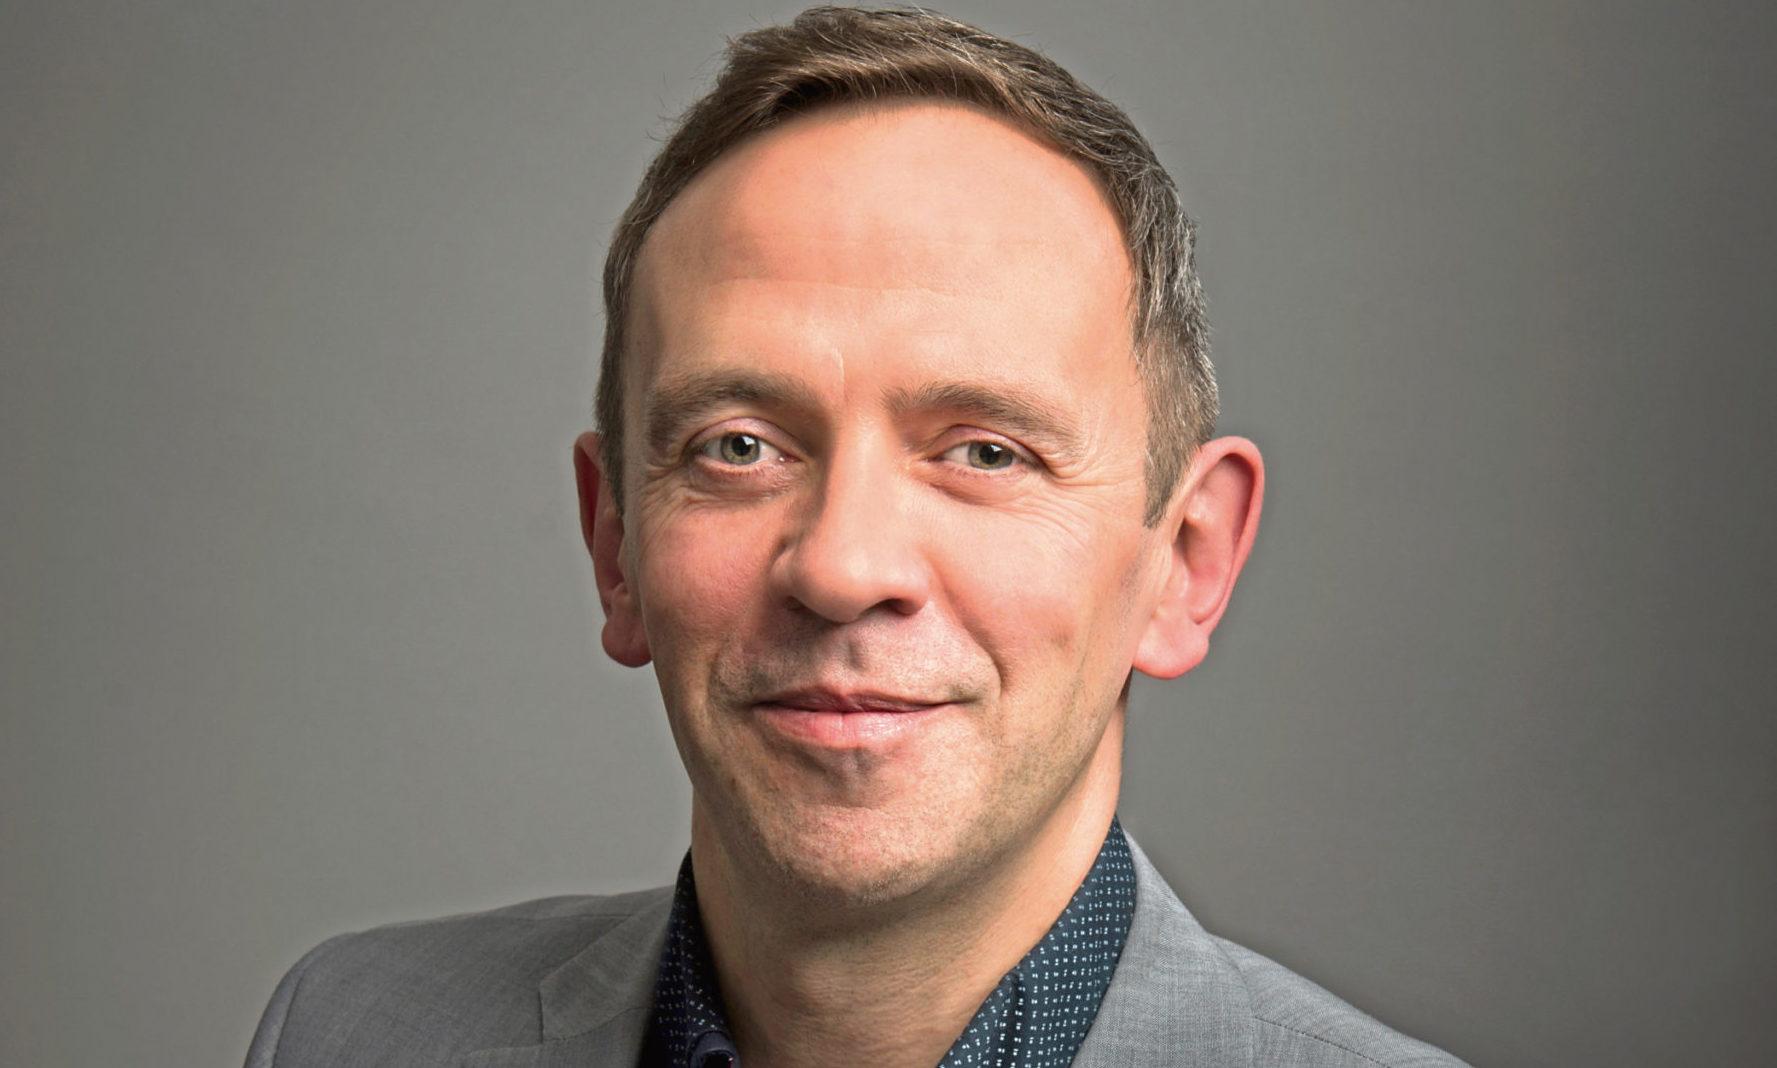 Aberdeen Business Network director Andrew Smith